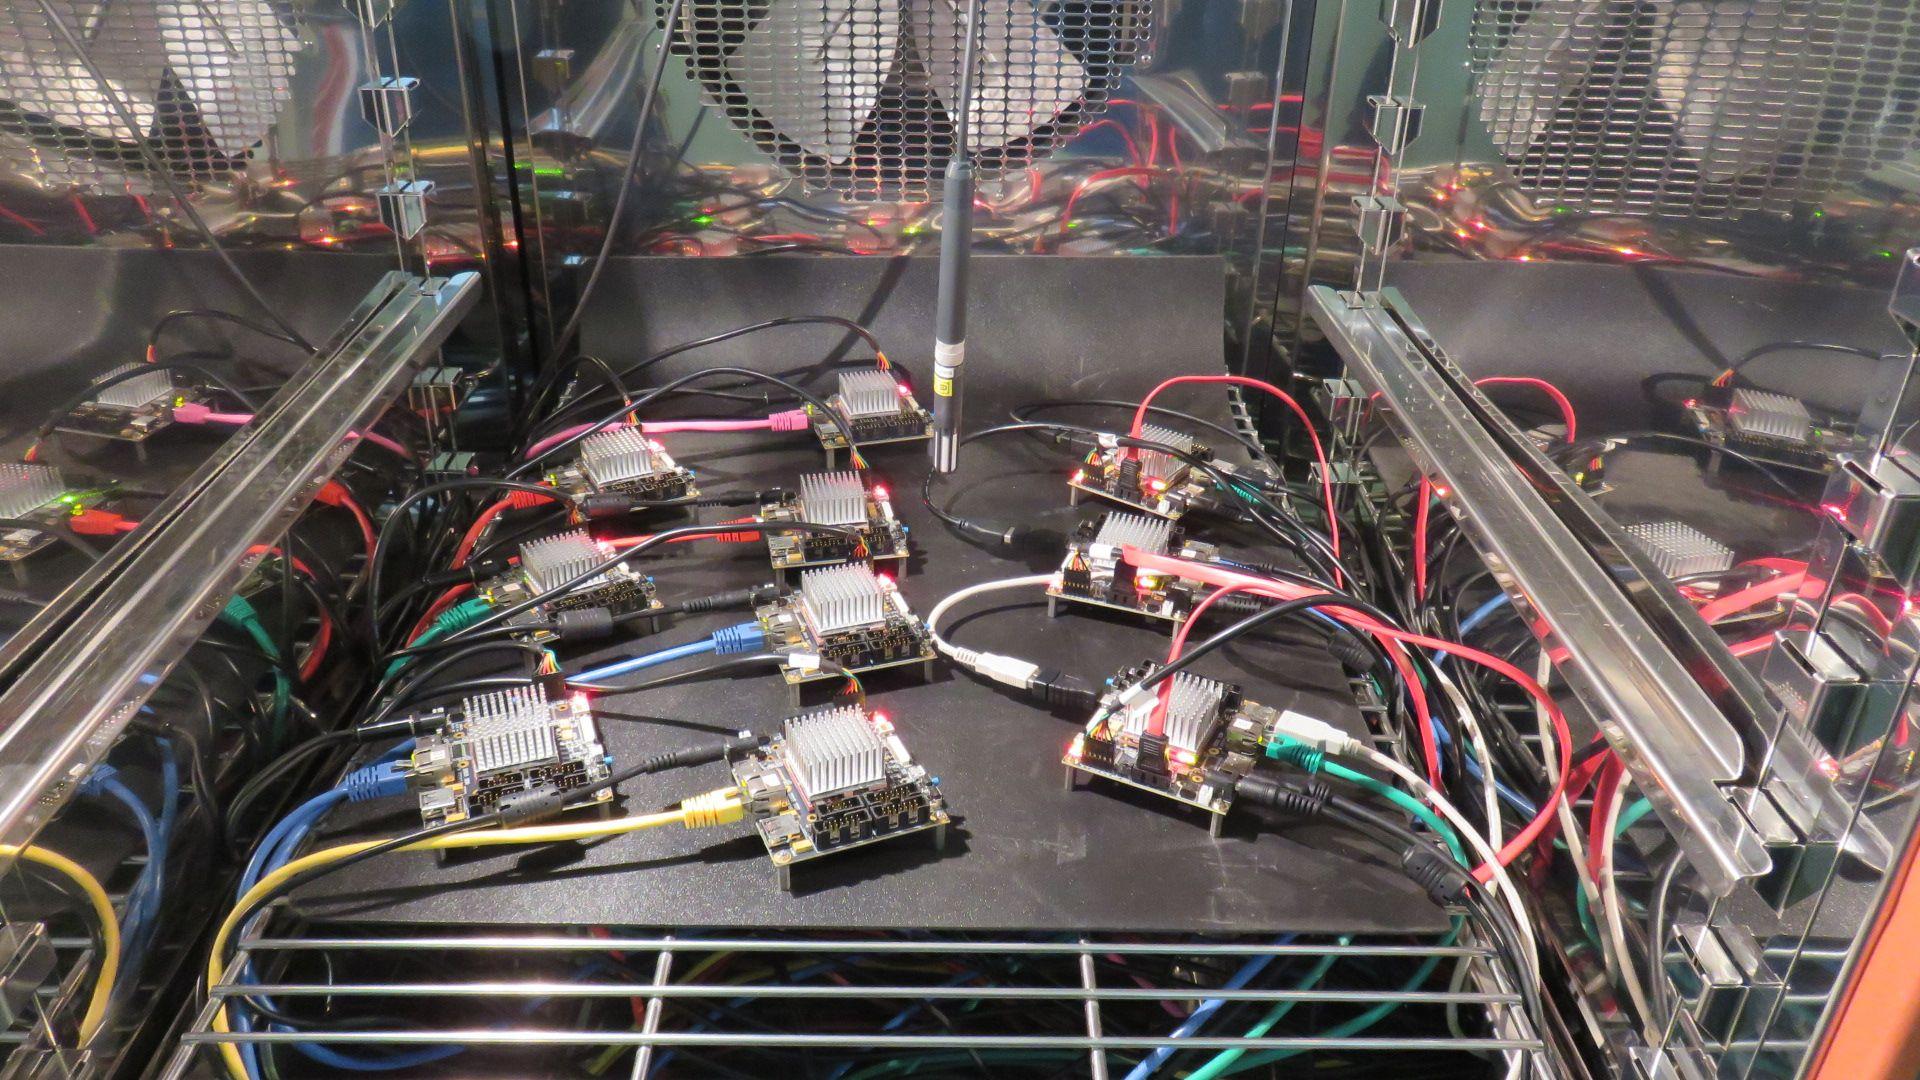 iMX6 TinyRex Testing in an Environmental chamber - iMX6 Rex